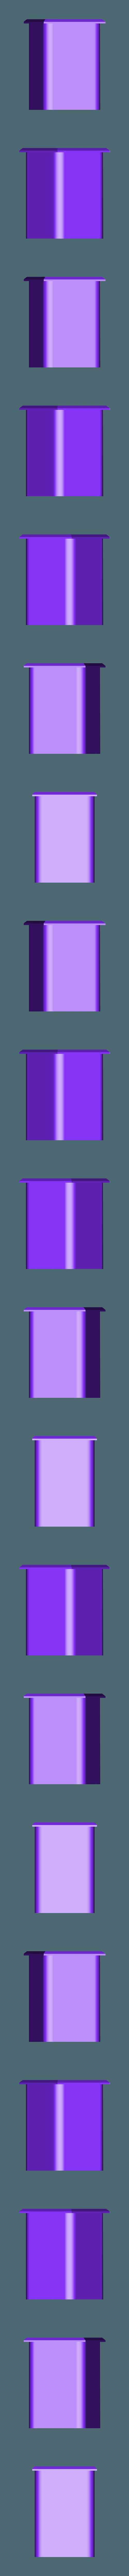 Insert.STL Download free STL file Lithophane Light Box Desktop Organizer Pencil • 3D print object, HoytDesign